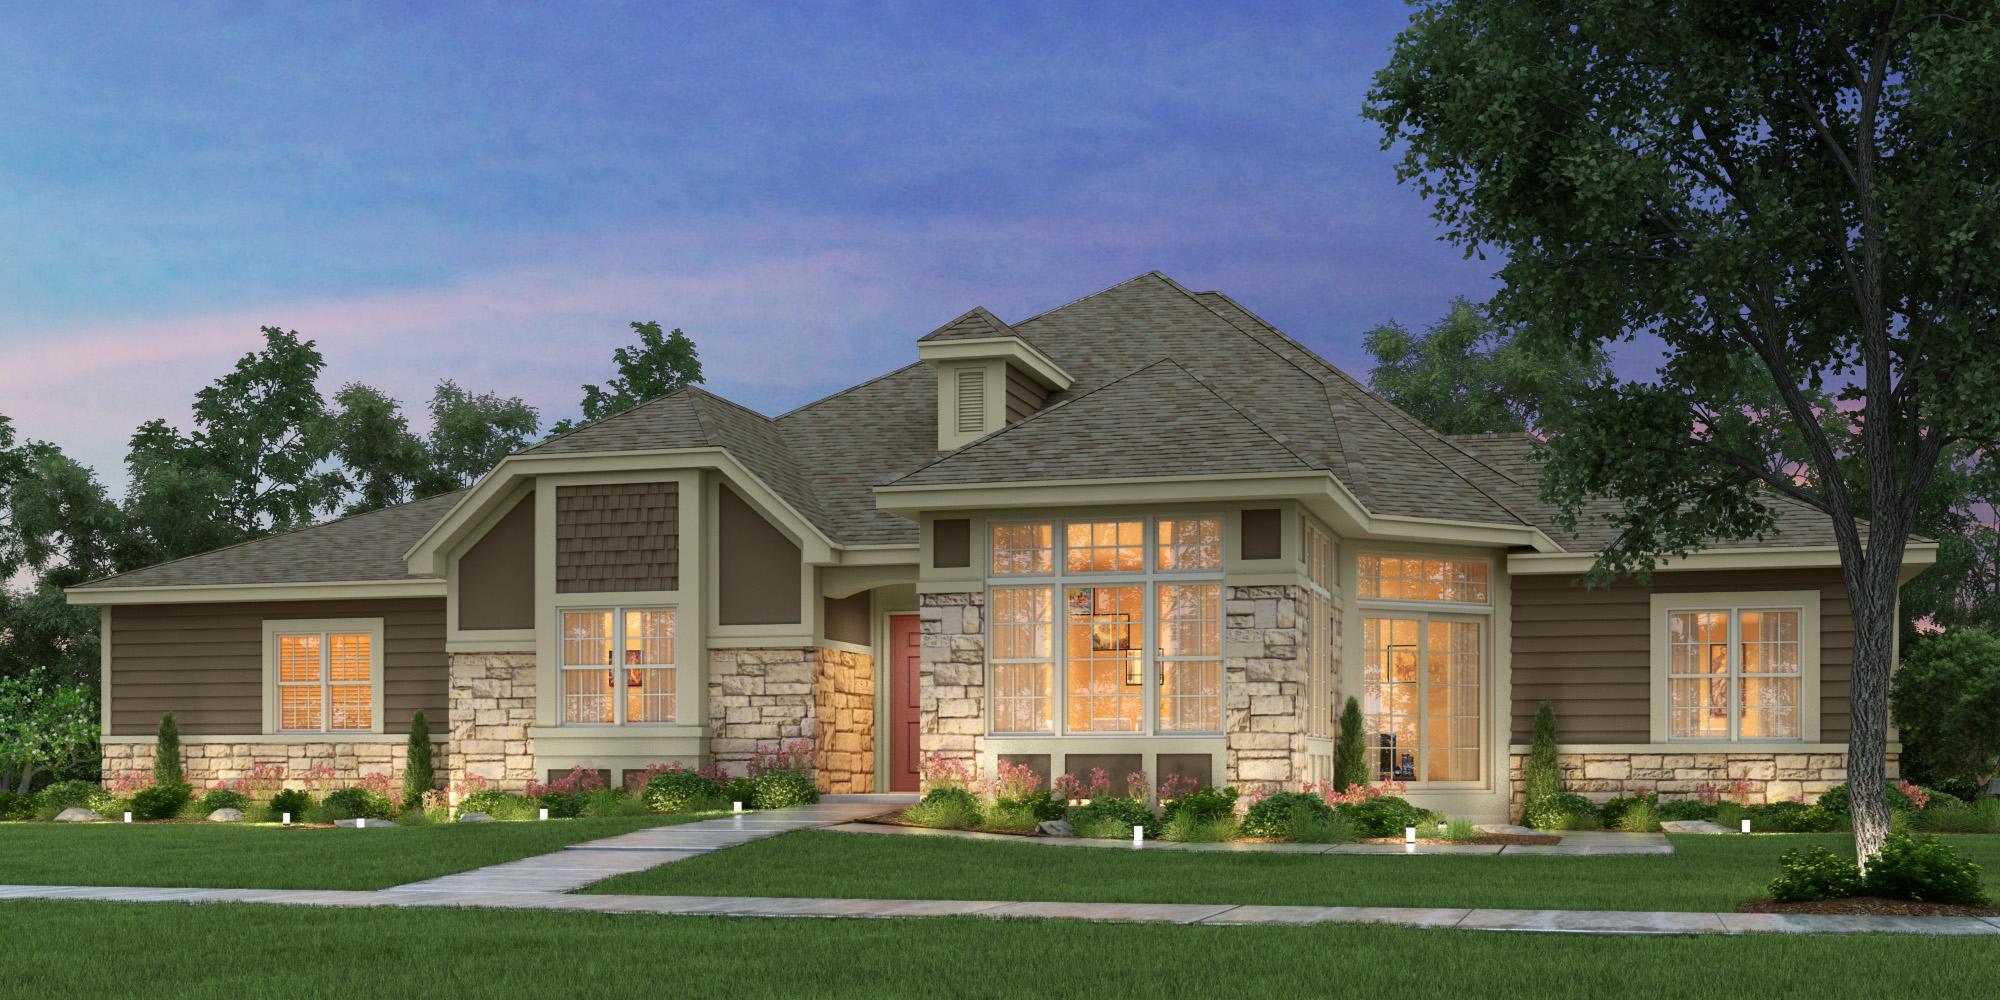 4357 Creekside Pass, Brookfield, Wisconsin 53005, 2 Bedrooms Bedrooms, 7 Rooms Rooms,2 BathroomsBathrooms,Condominiums,For Sale,Creekside Pass,1,1720373